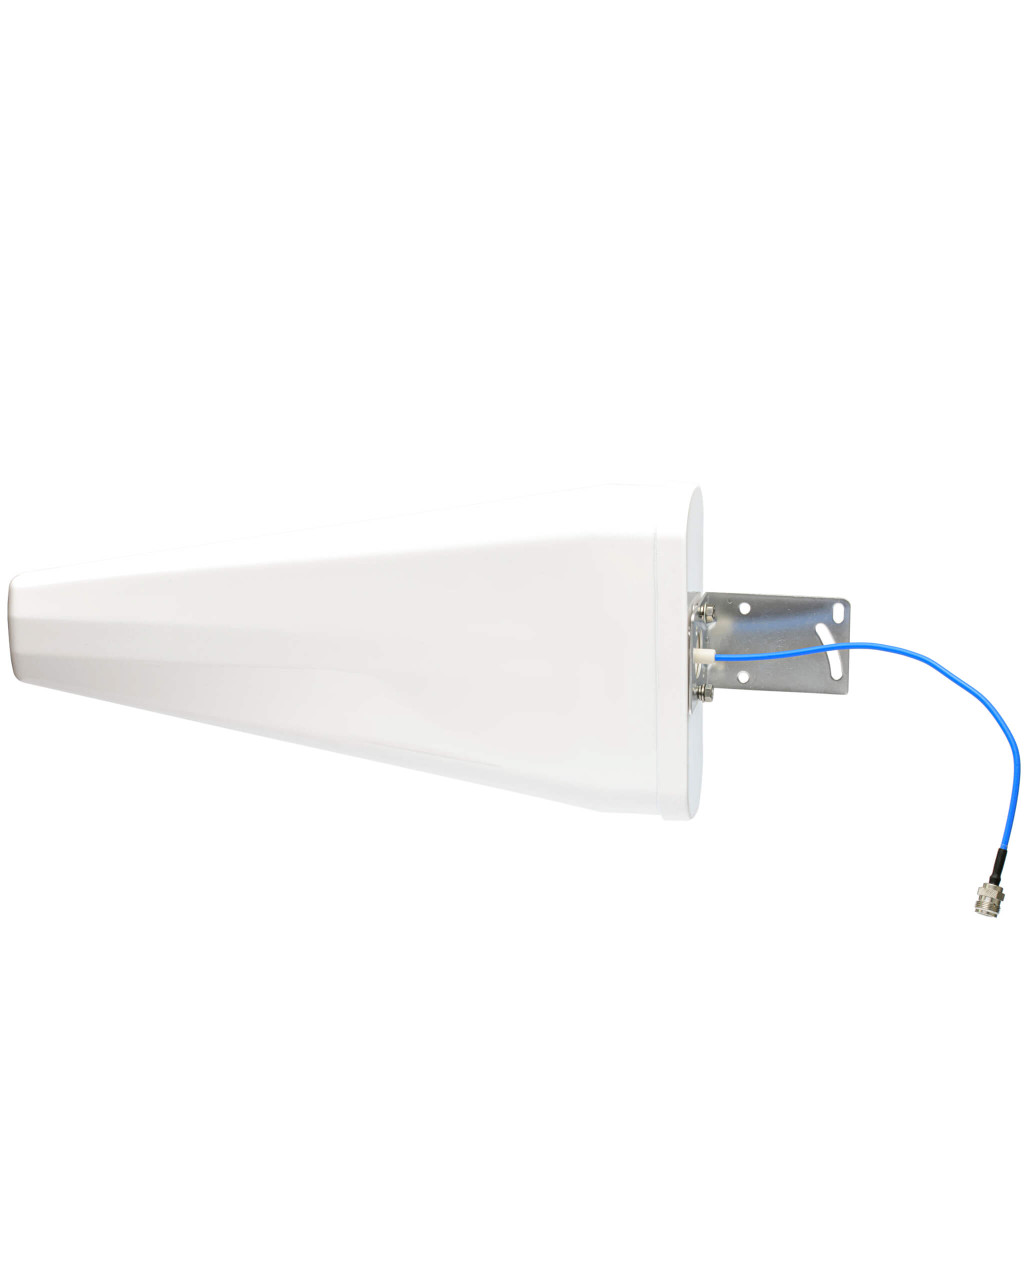 The Quicksilver - Yagi Directional Antenna